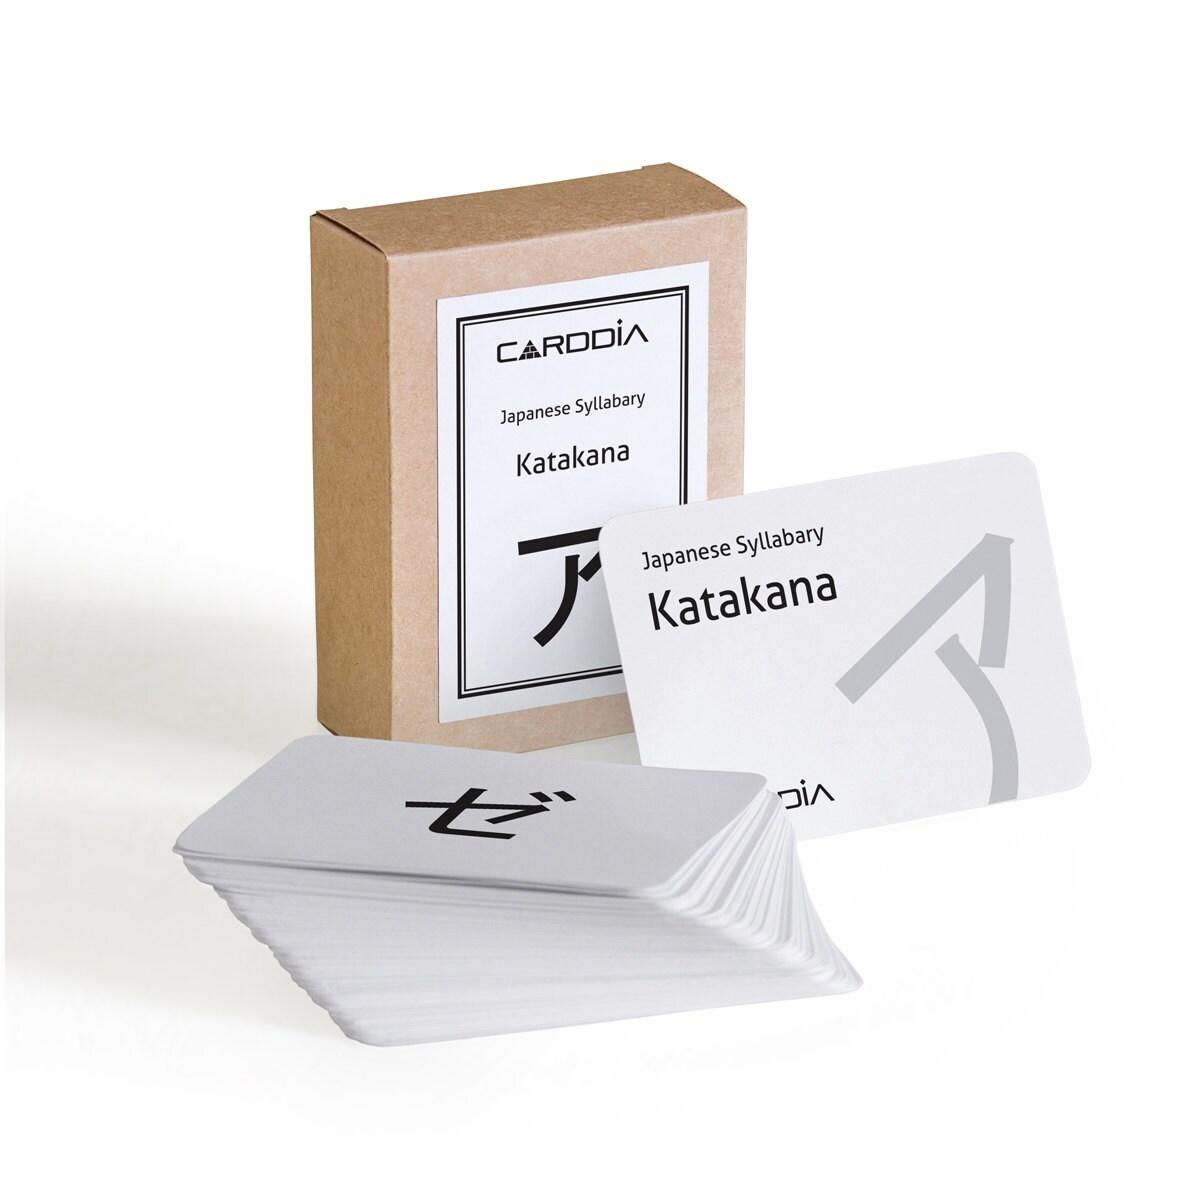 Japanese Syllabary Katakana Flashcards